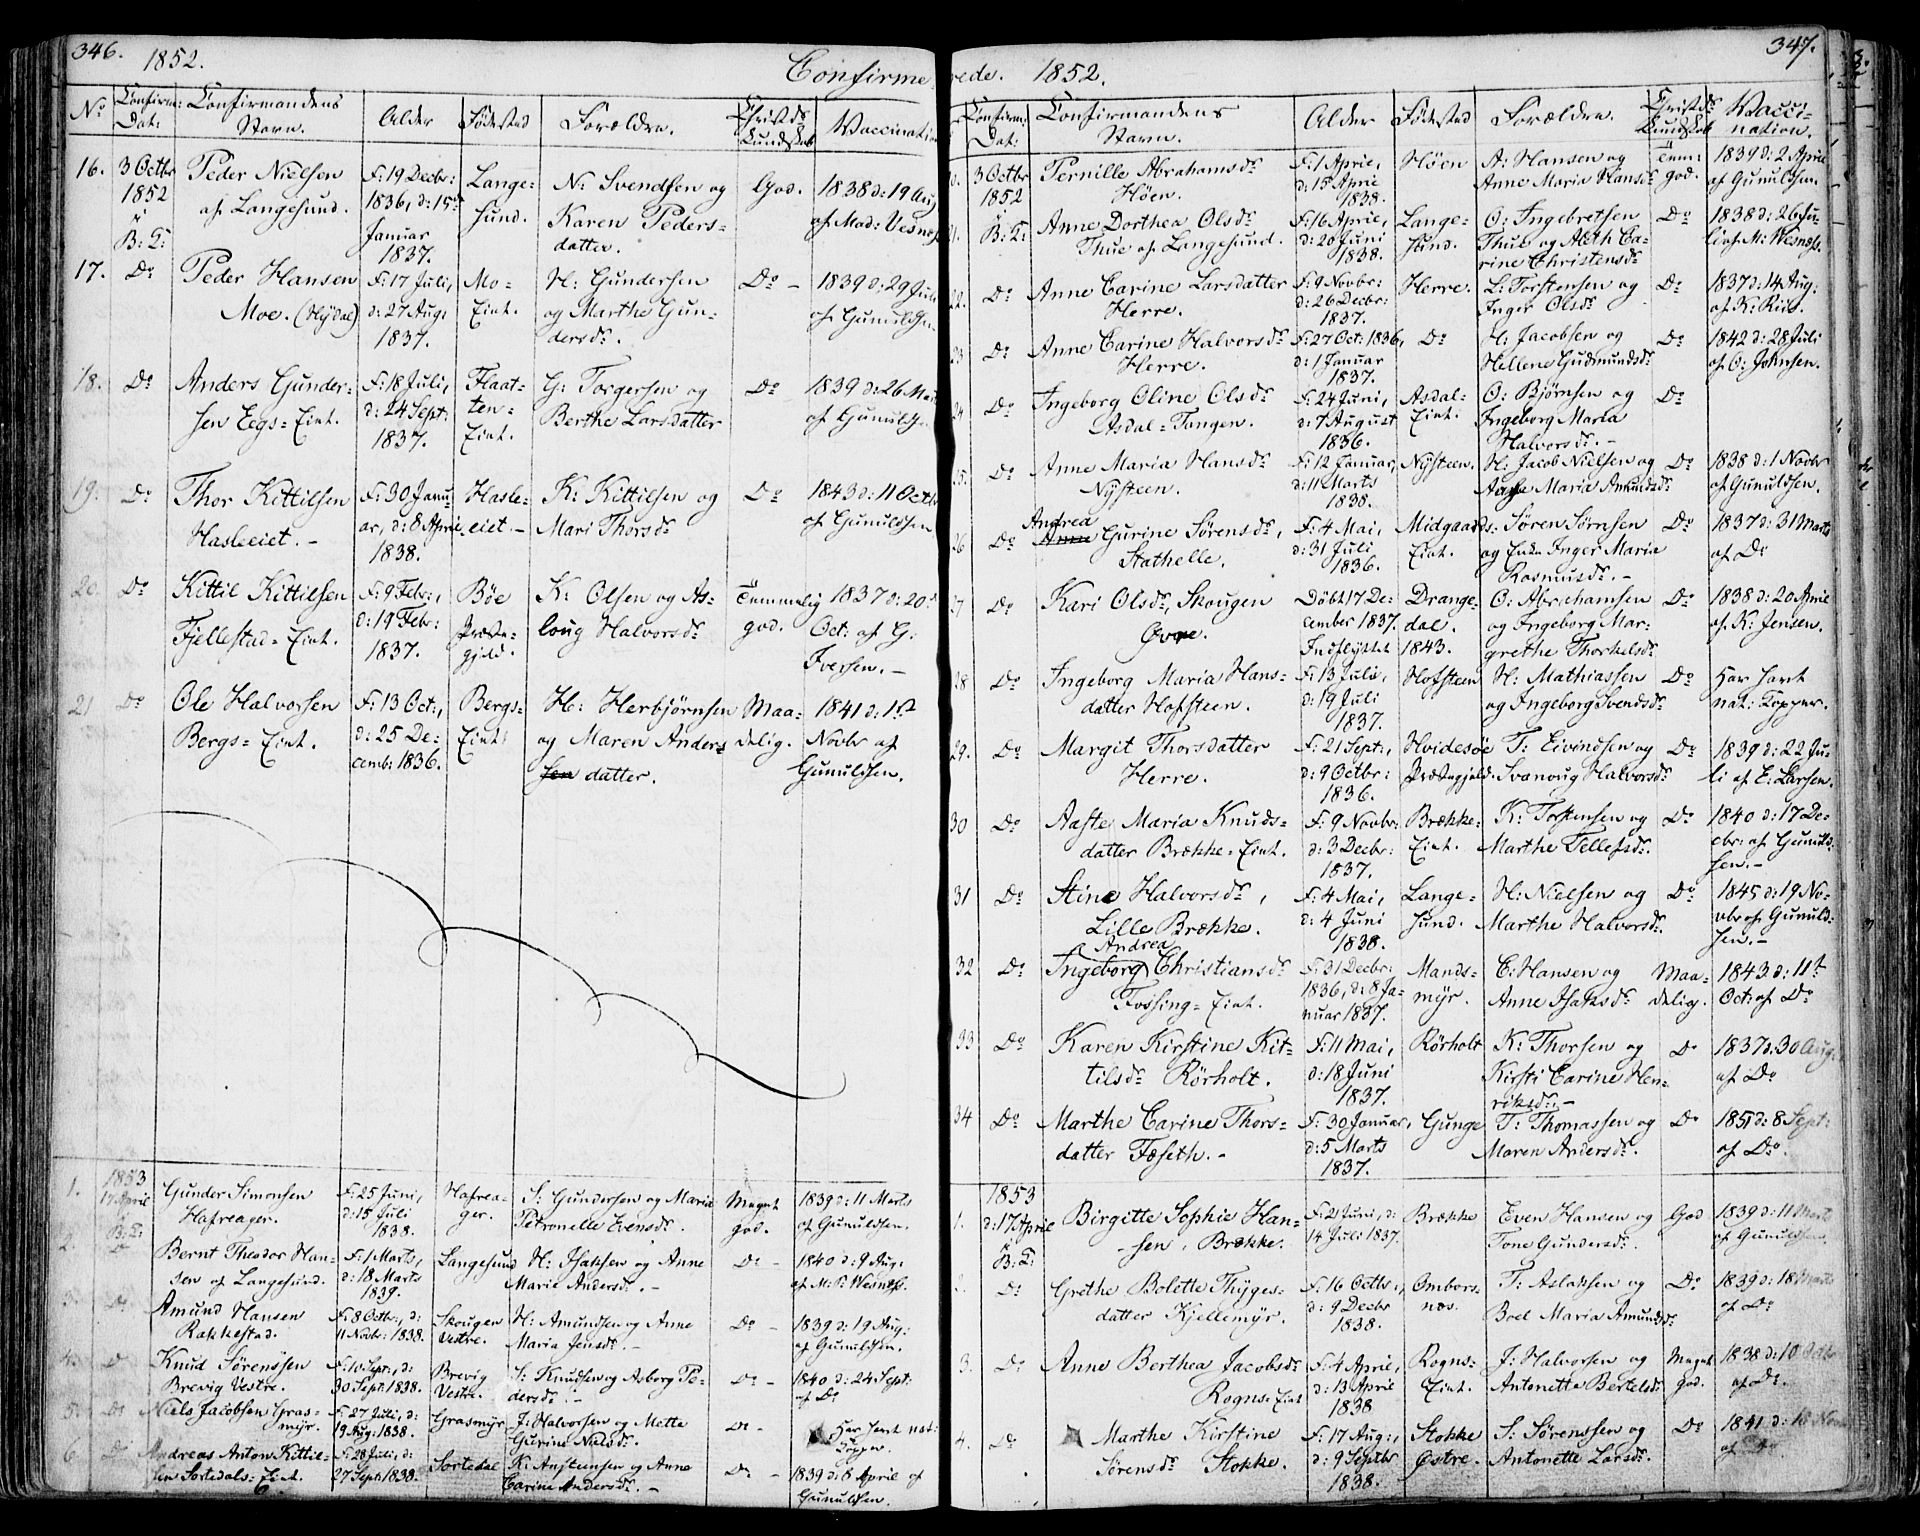 SAKO, Bamble kirkebøker, F/Fa/L0004: Ministerialbok nr. I 4, 1834-1853, s. 346-347